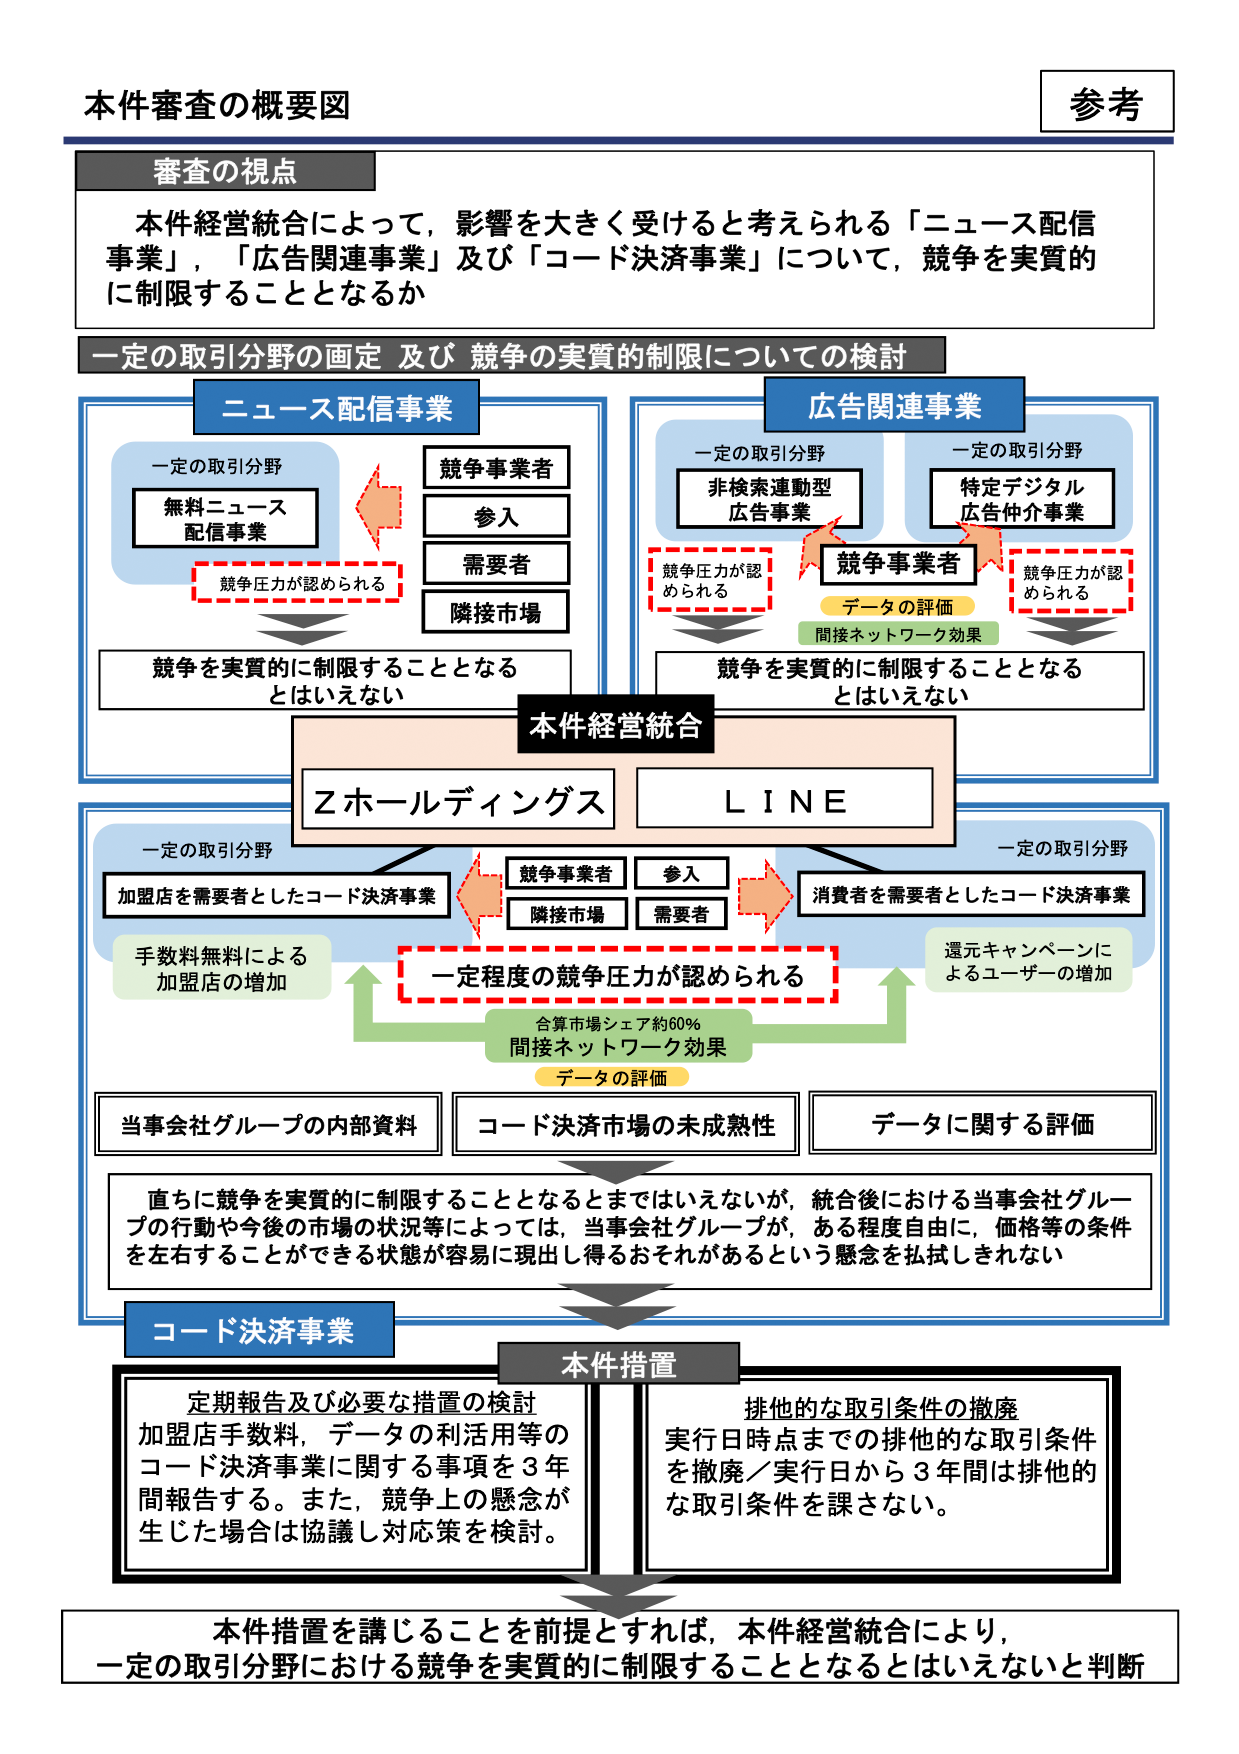 ZホールディングスとLINEの経営統合に関する審査結果の事業領域別コメント(出典:公正取引委員会)